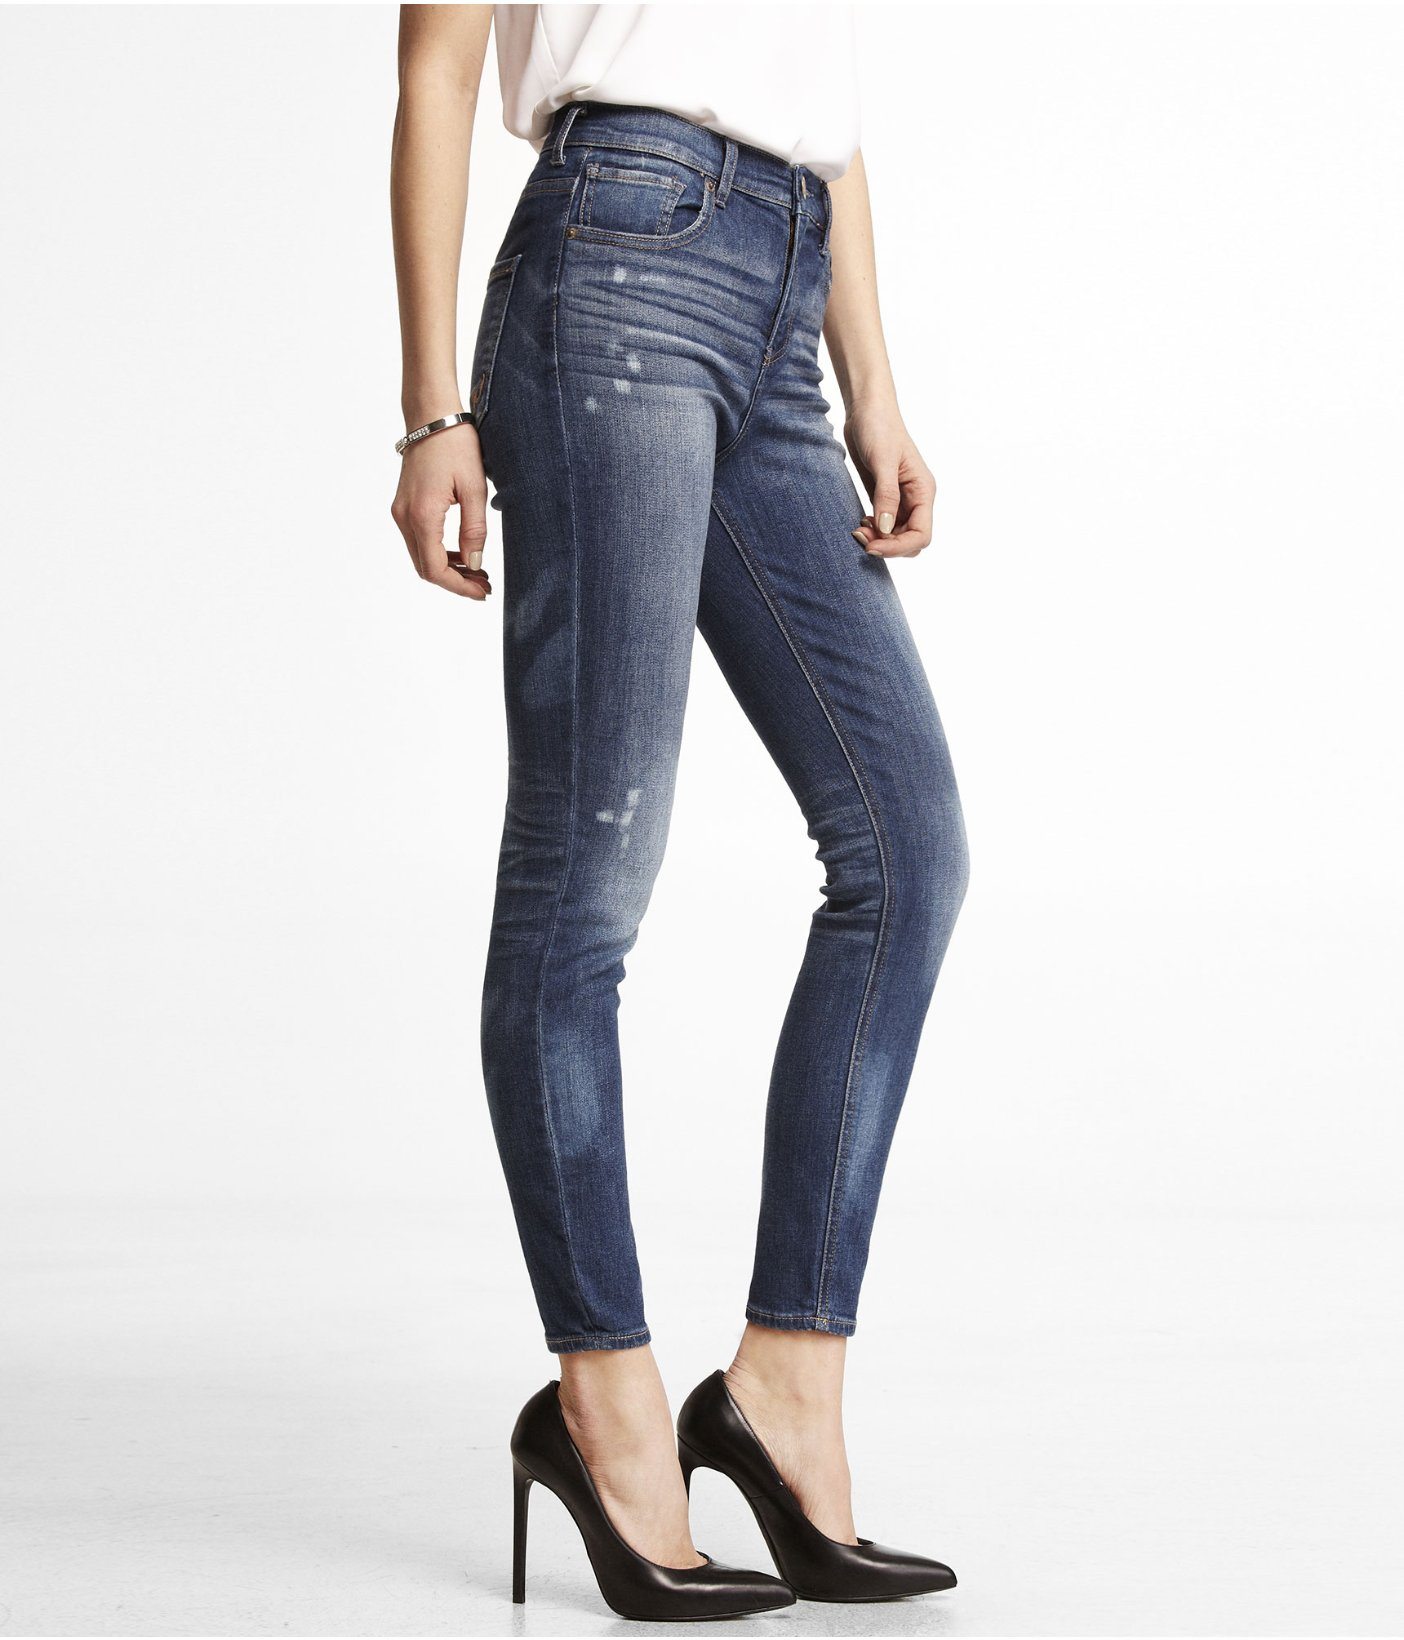 1bf7c404331 Gallery. Women s Vintage Jeans Women s Royal Blue ...